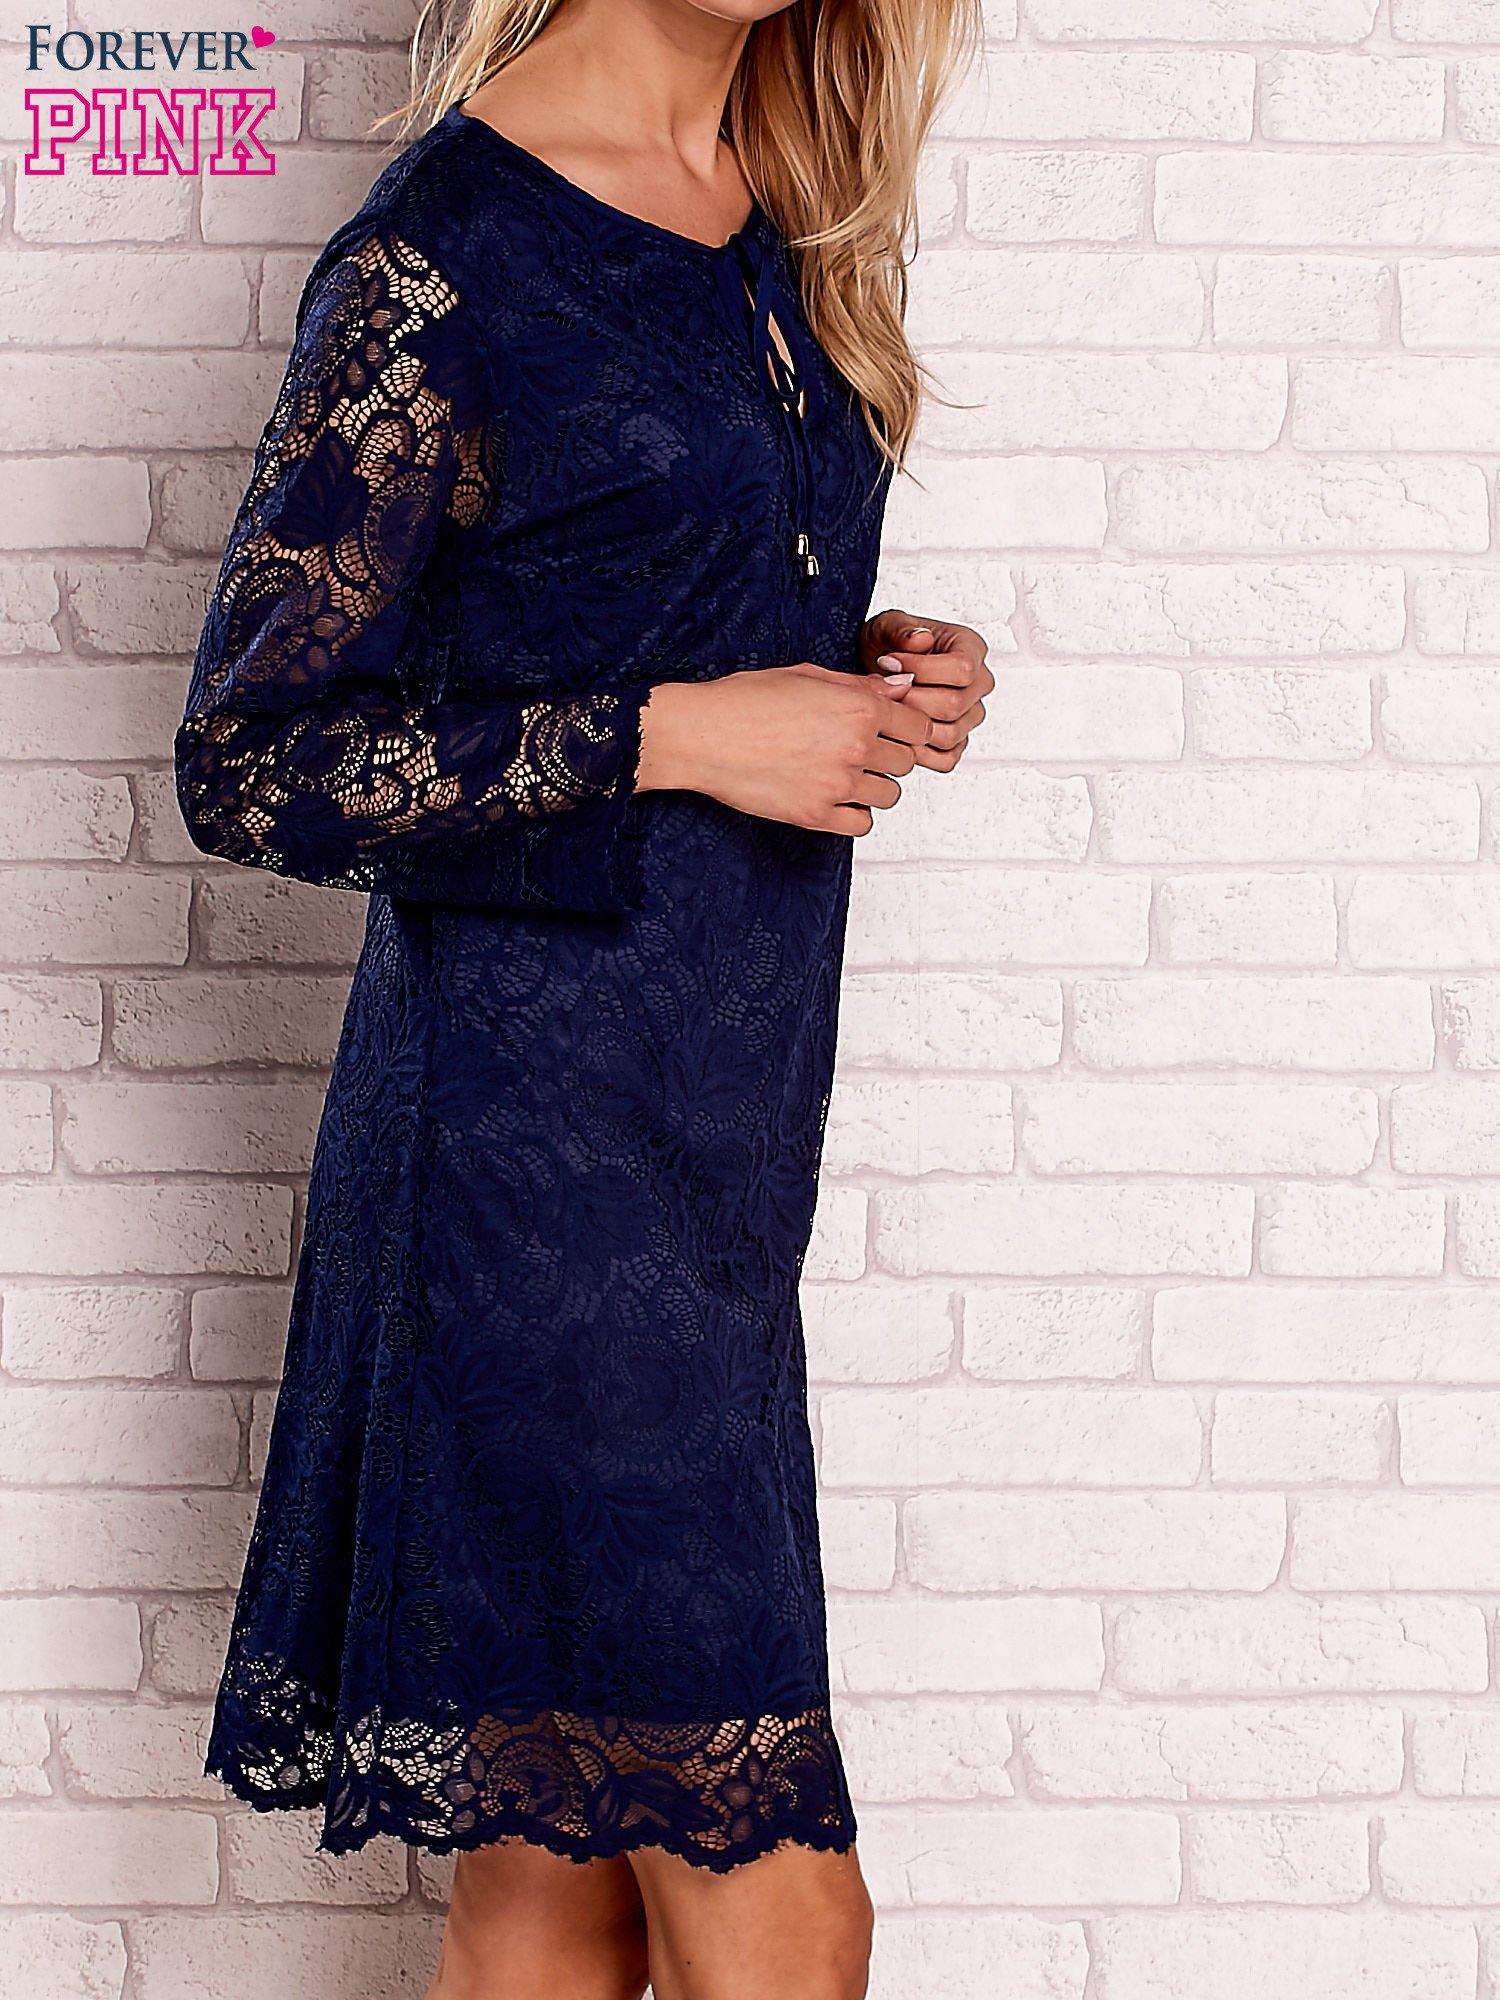 496d50a67d Granatowa koronkowa sukienka z wiązaniem - Sukienka koktajlowa ...